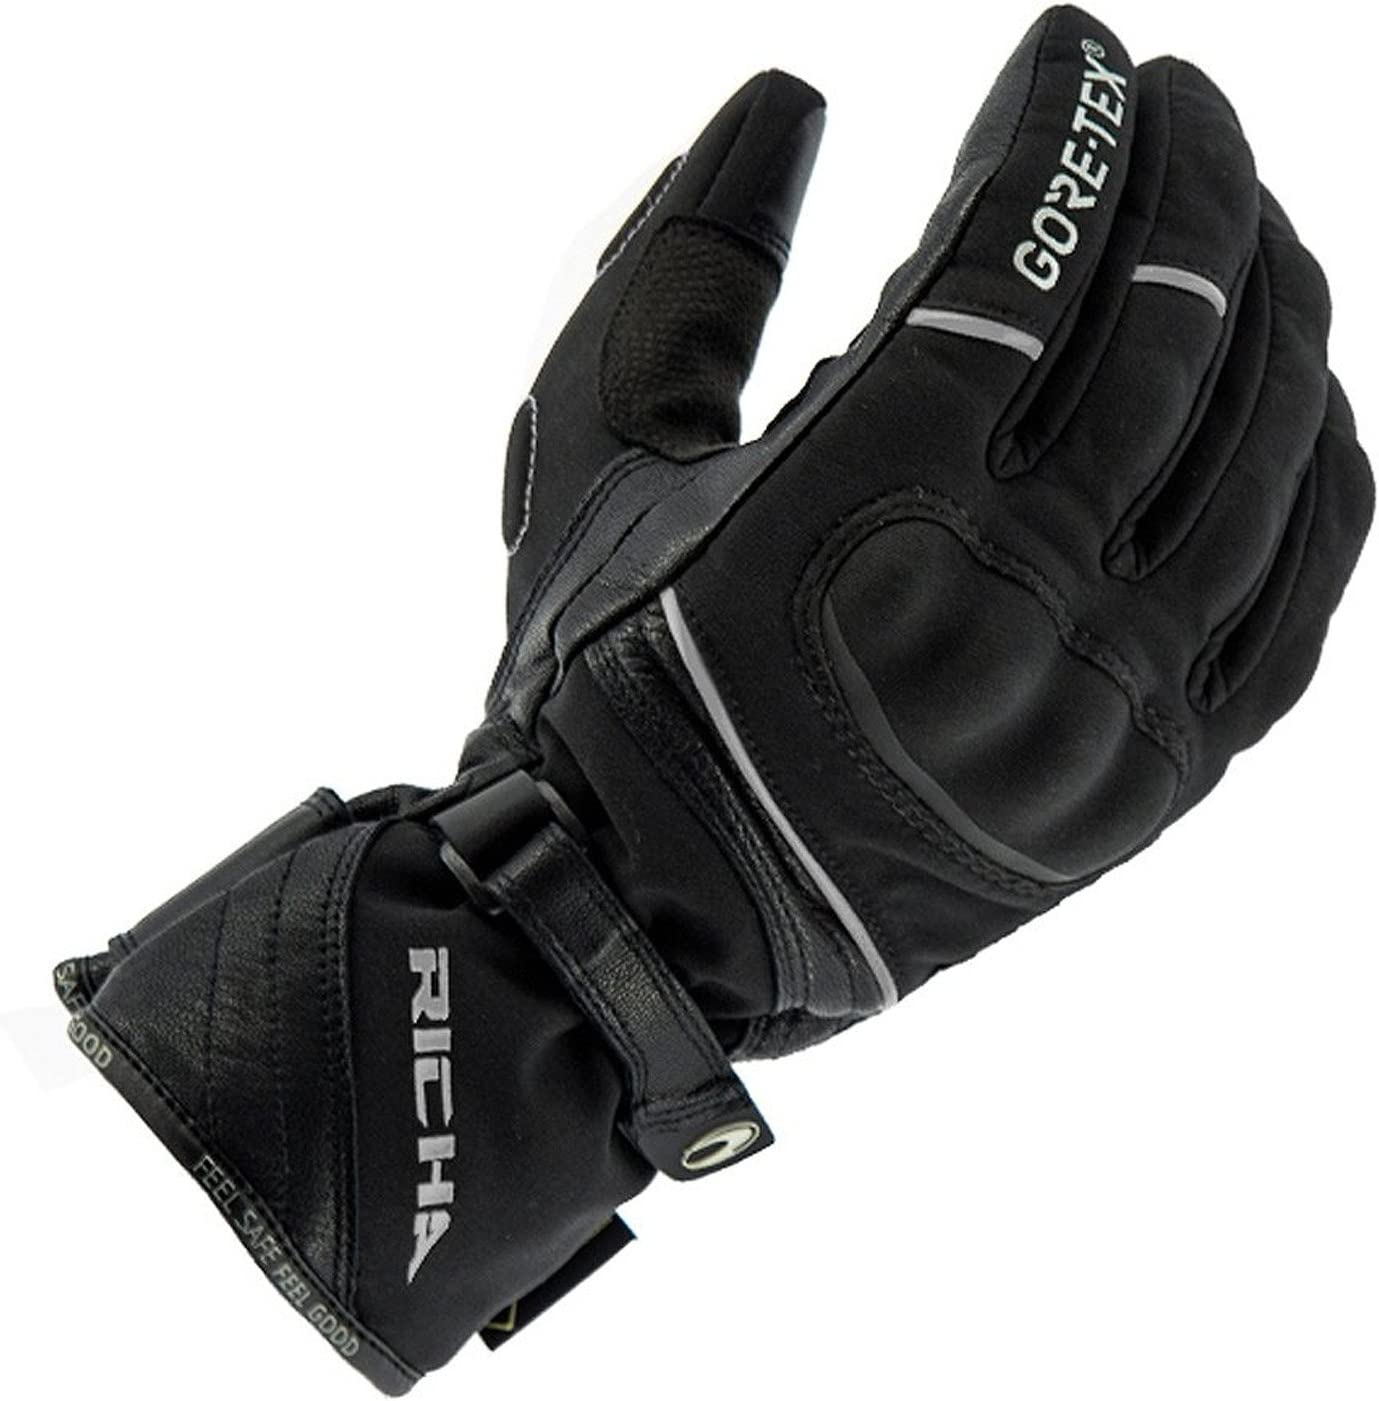 Richa Diana GTX GORE-TEX Leather Textile Ladies Motorcycle Gloves